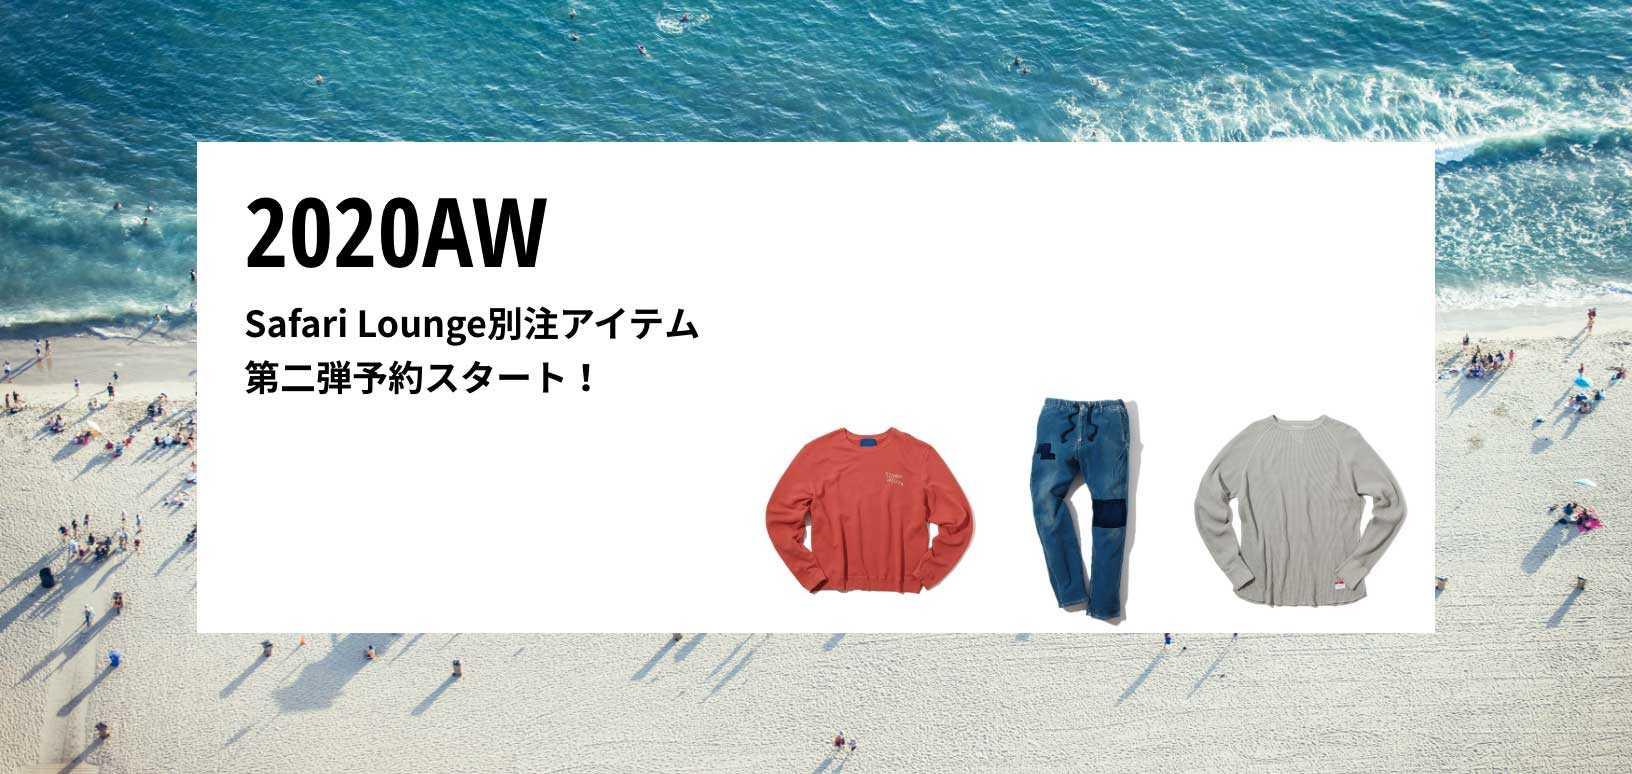 Safari Lounge別注アイテム先行予約スタート!